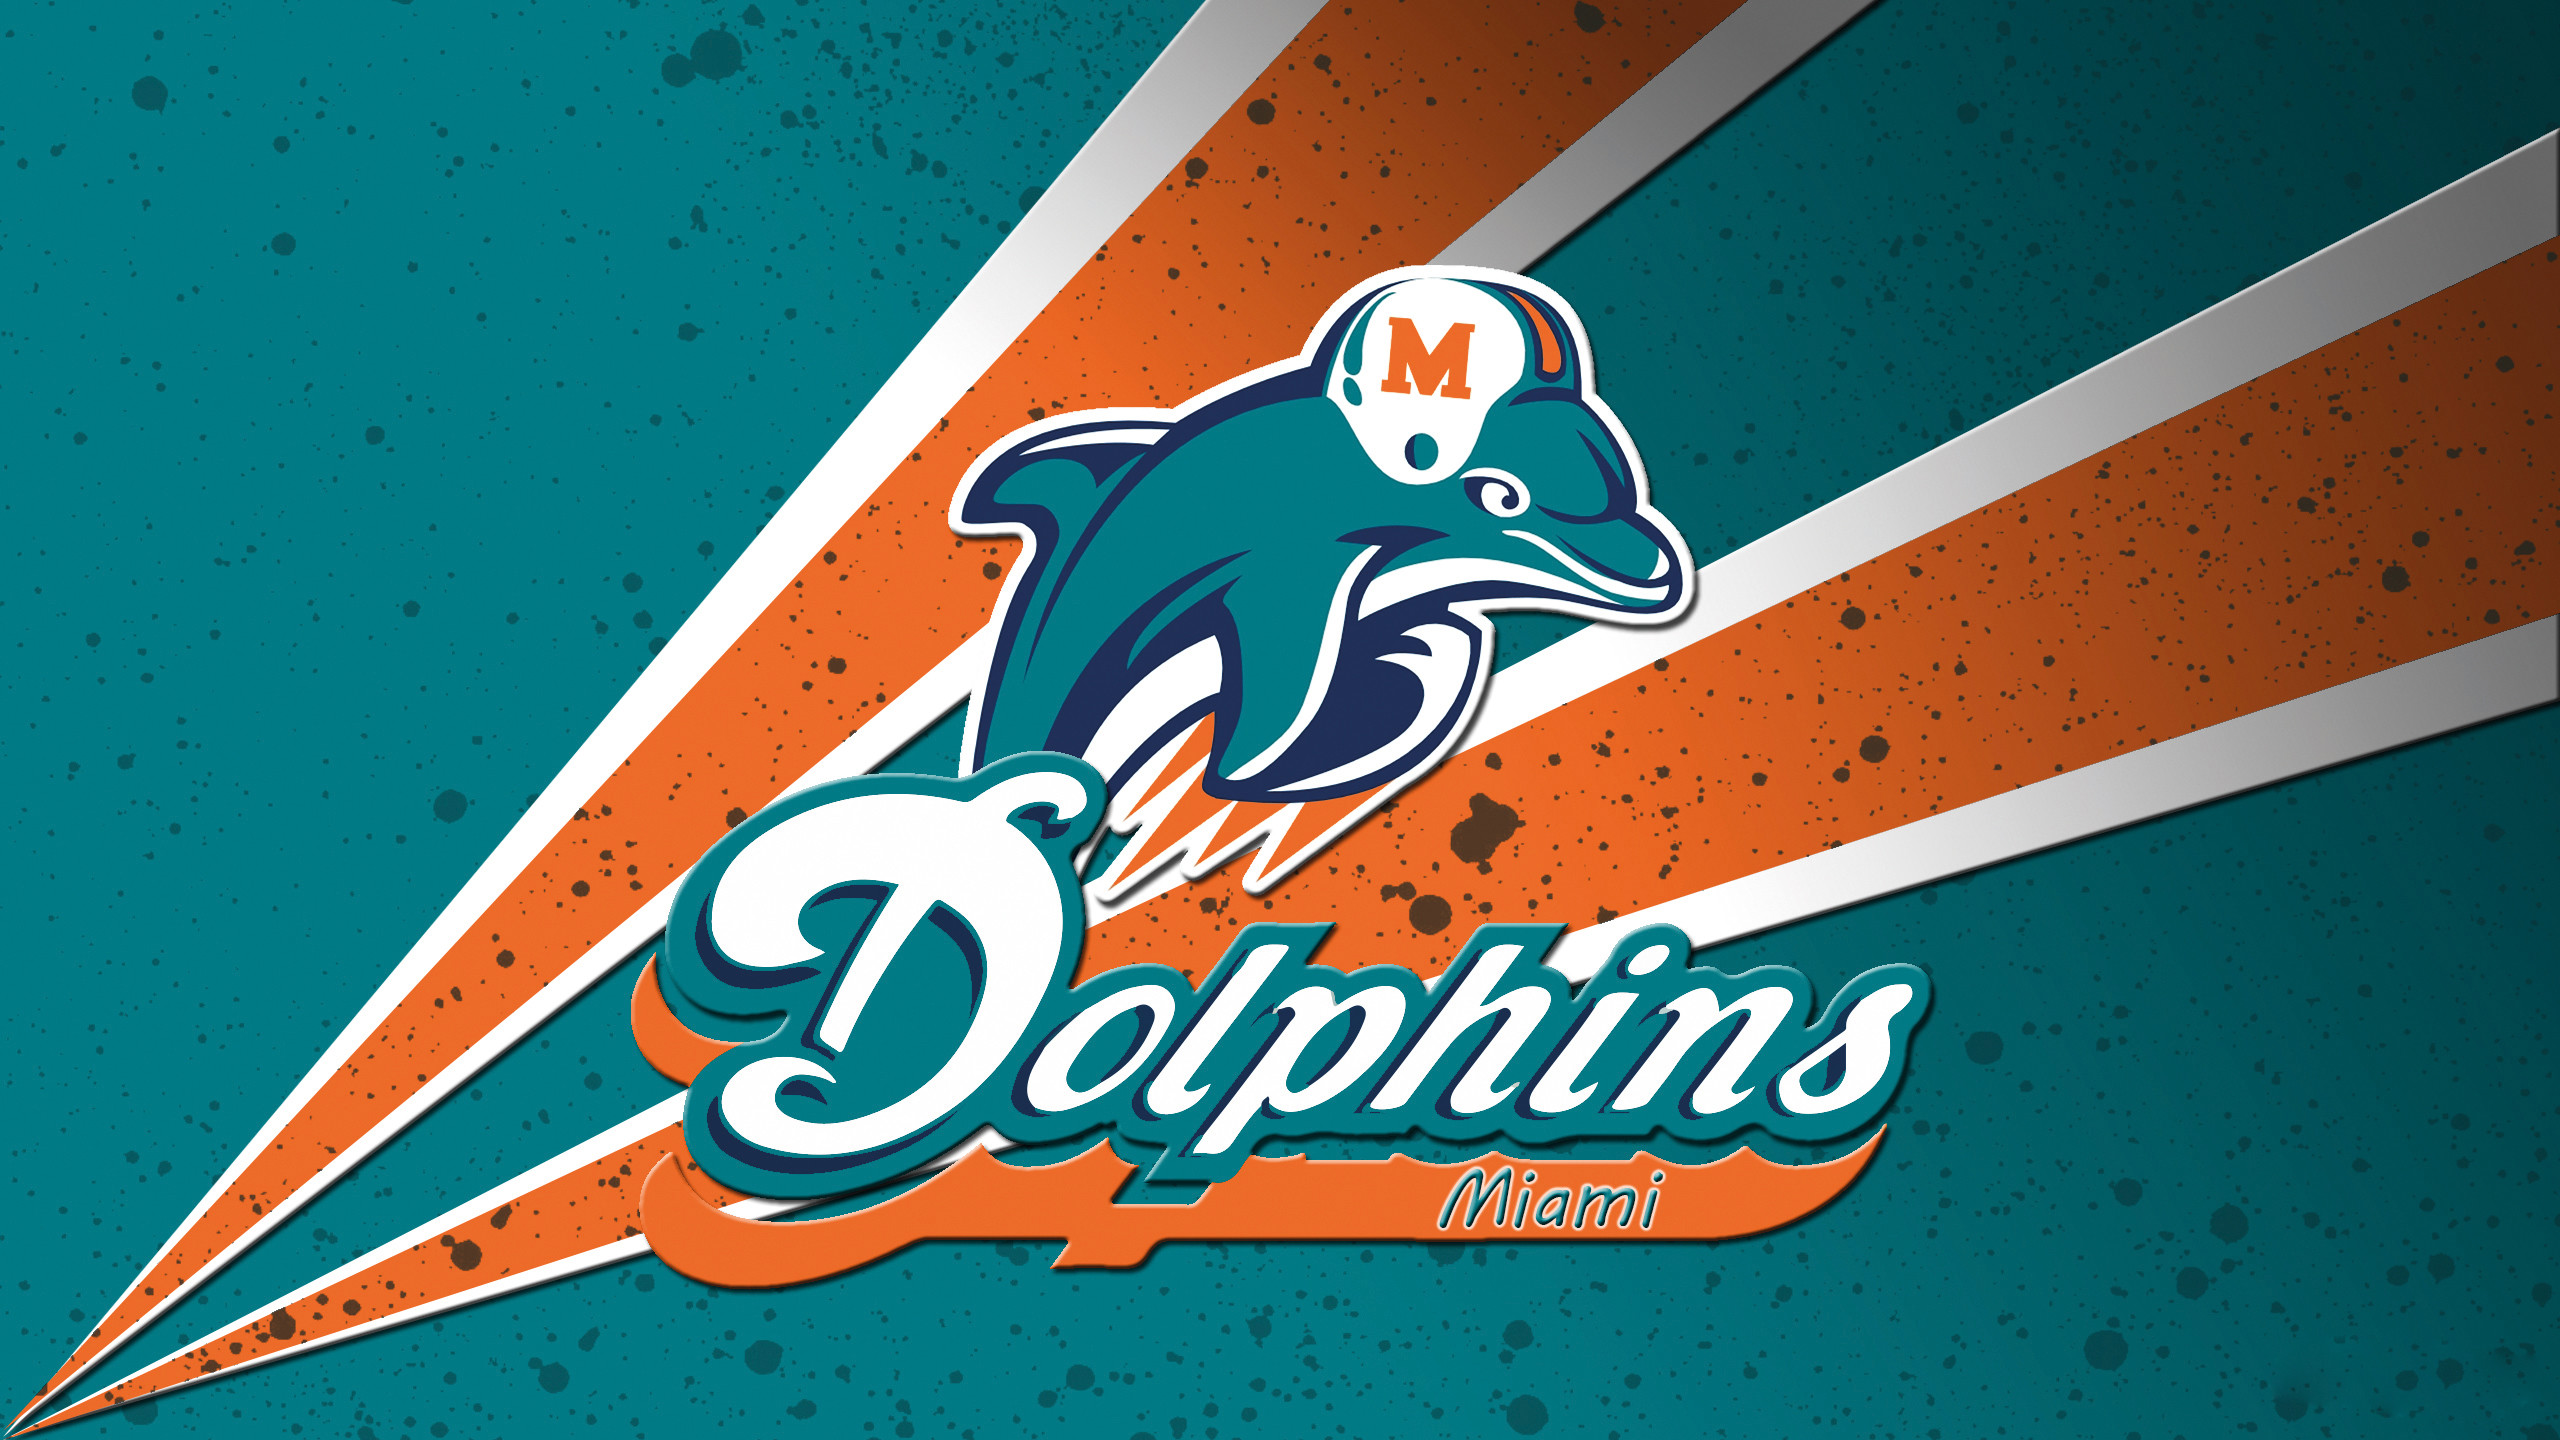 Logo-Miami-Dolphins-HD-Wallpaper